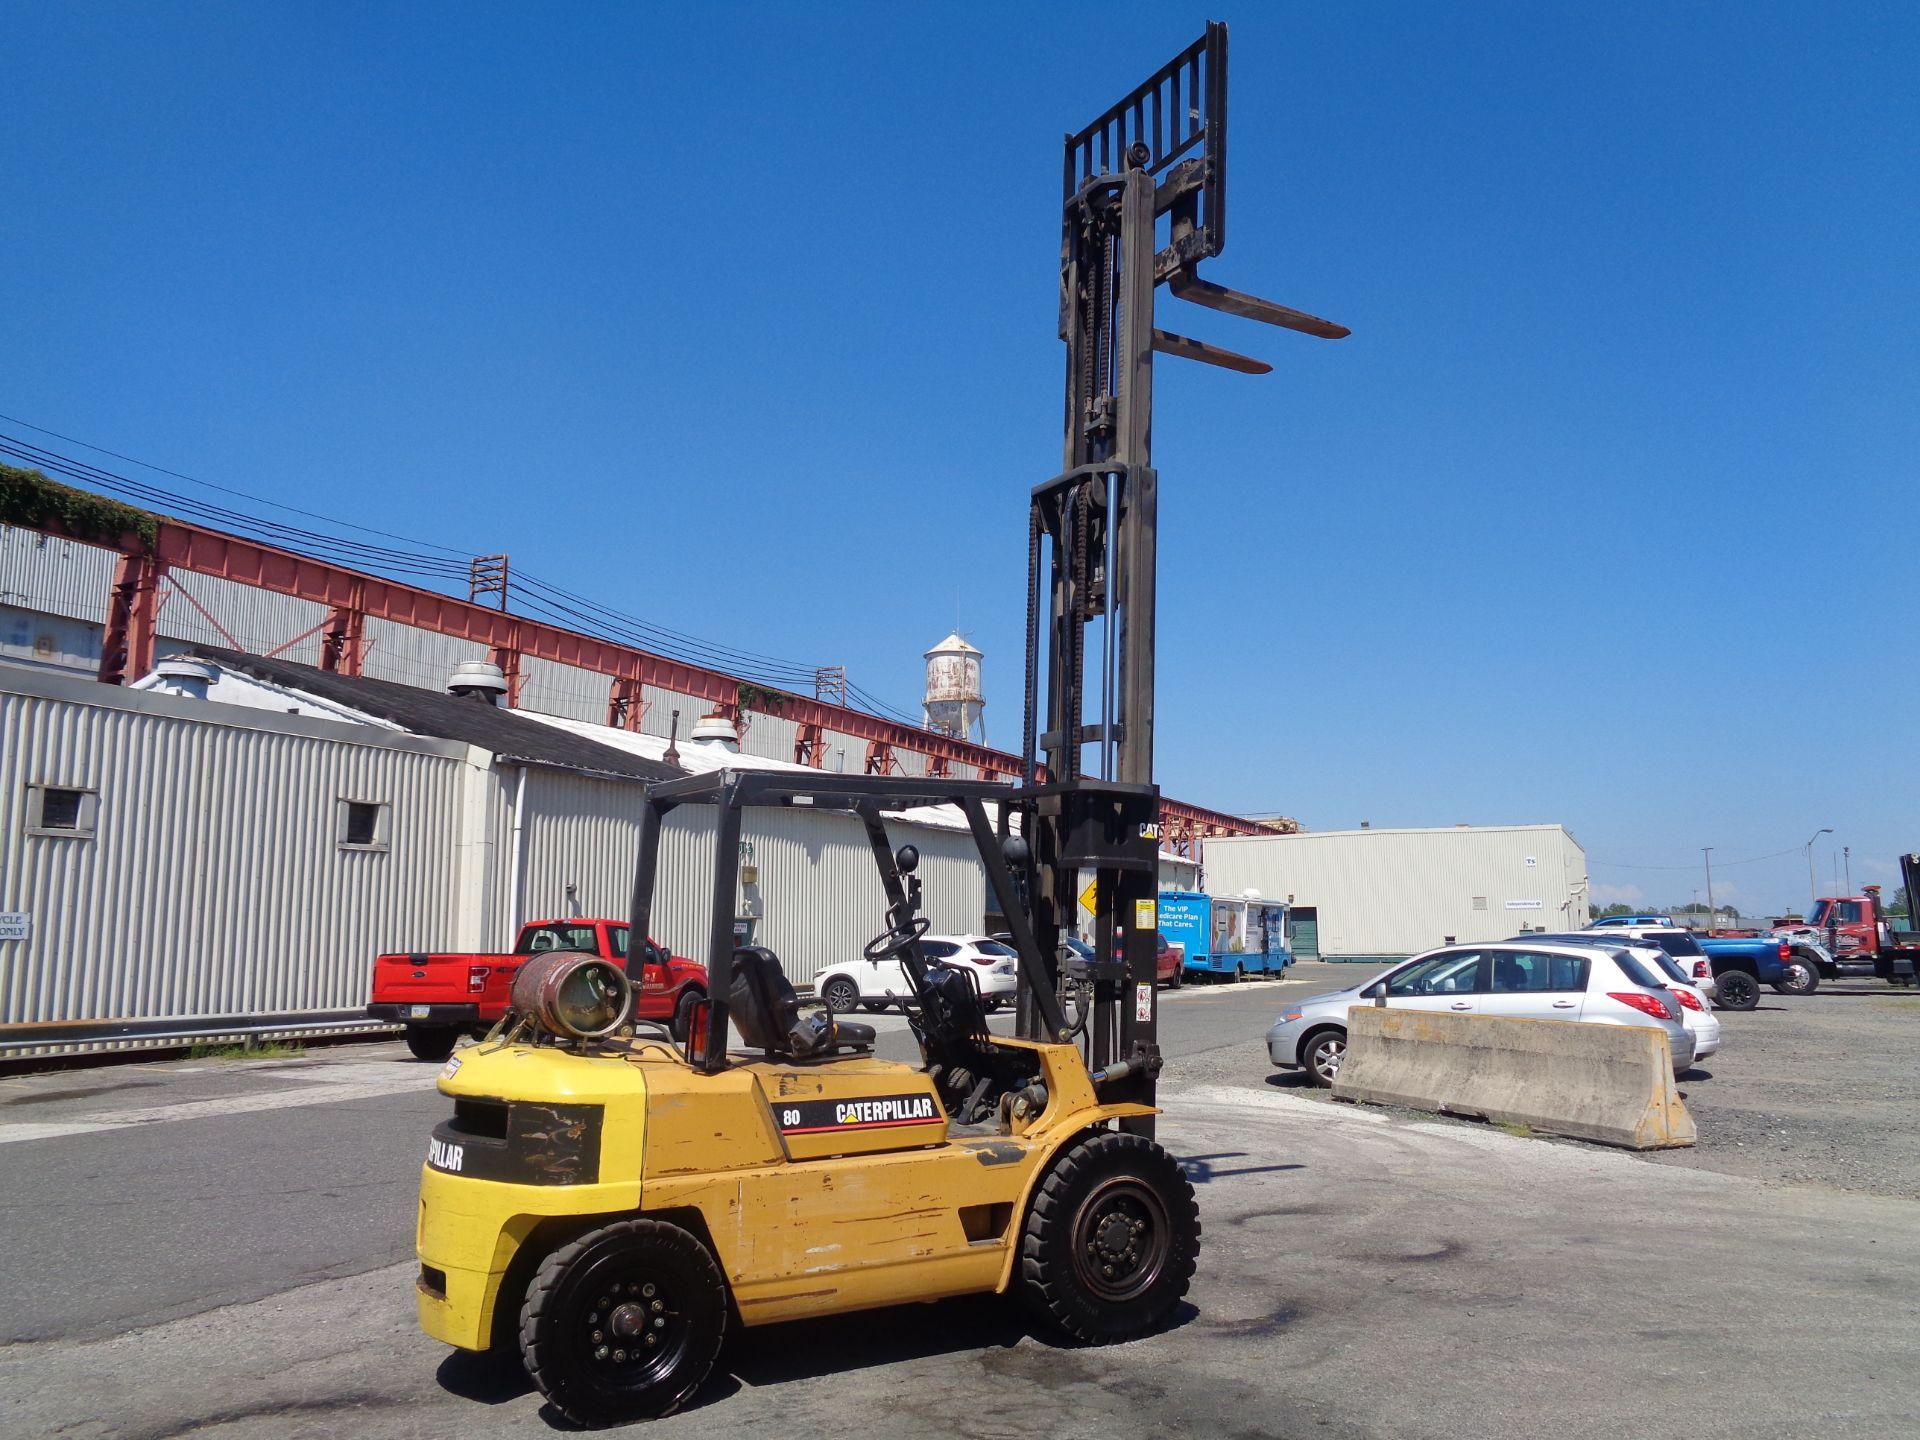 Lot 23 - Caterpillar GP40 8,000lb Pneumatic Forklift